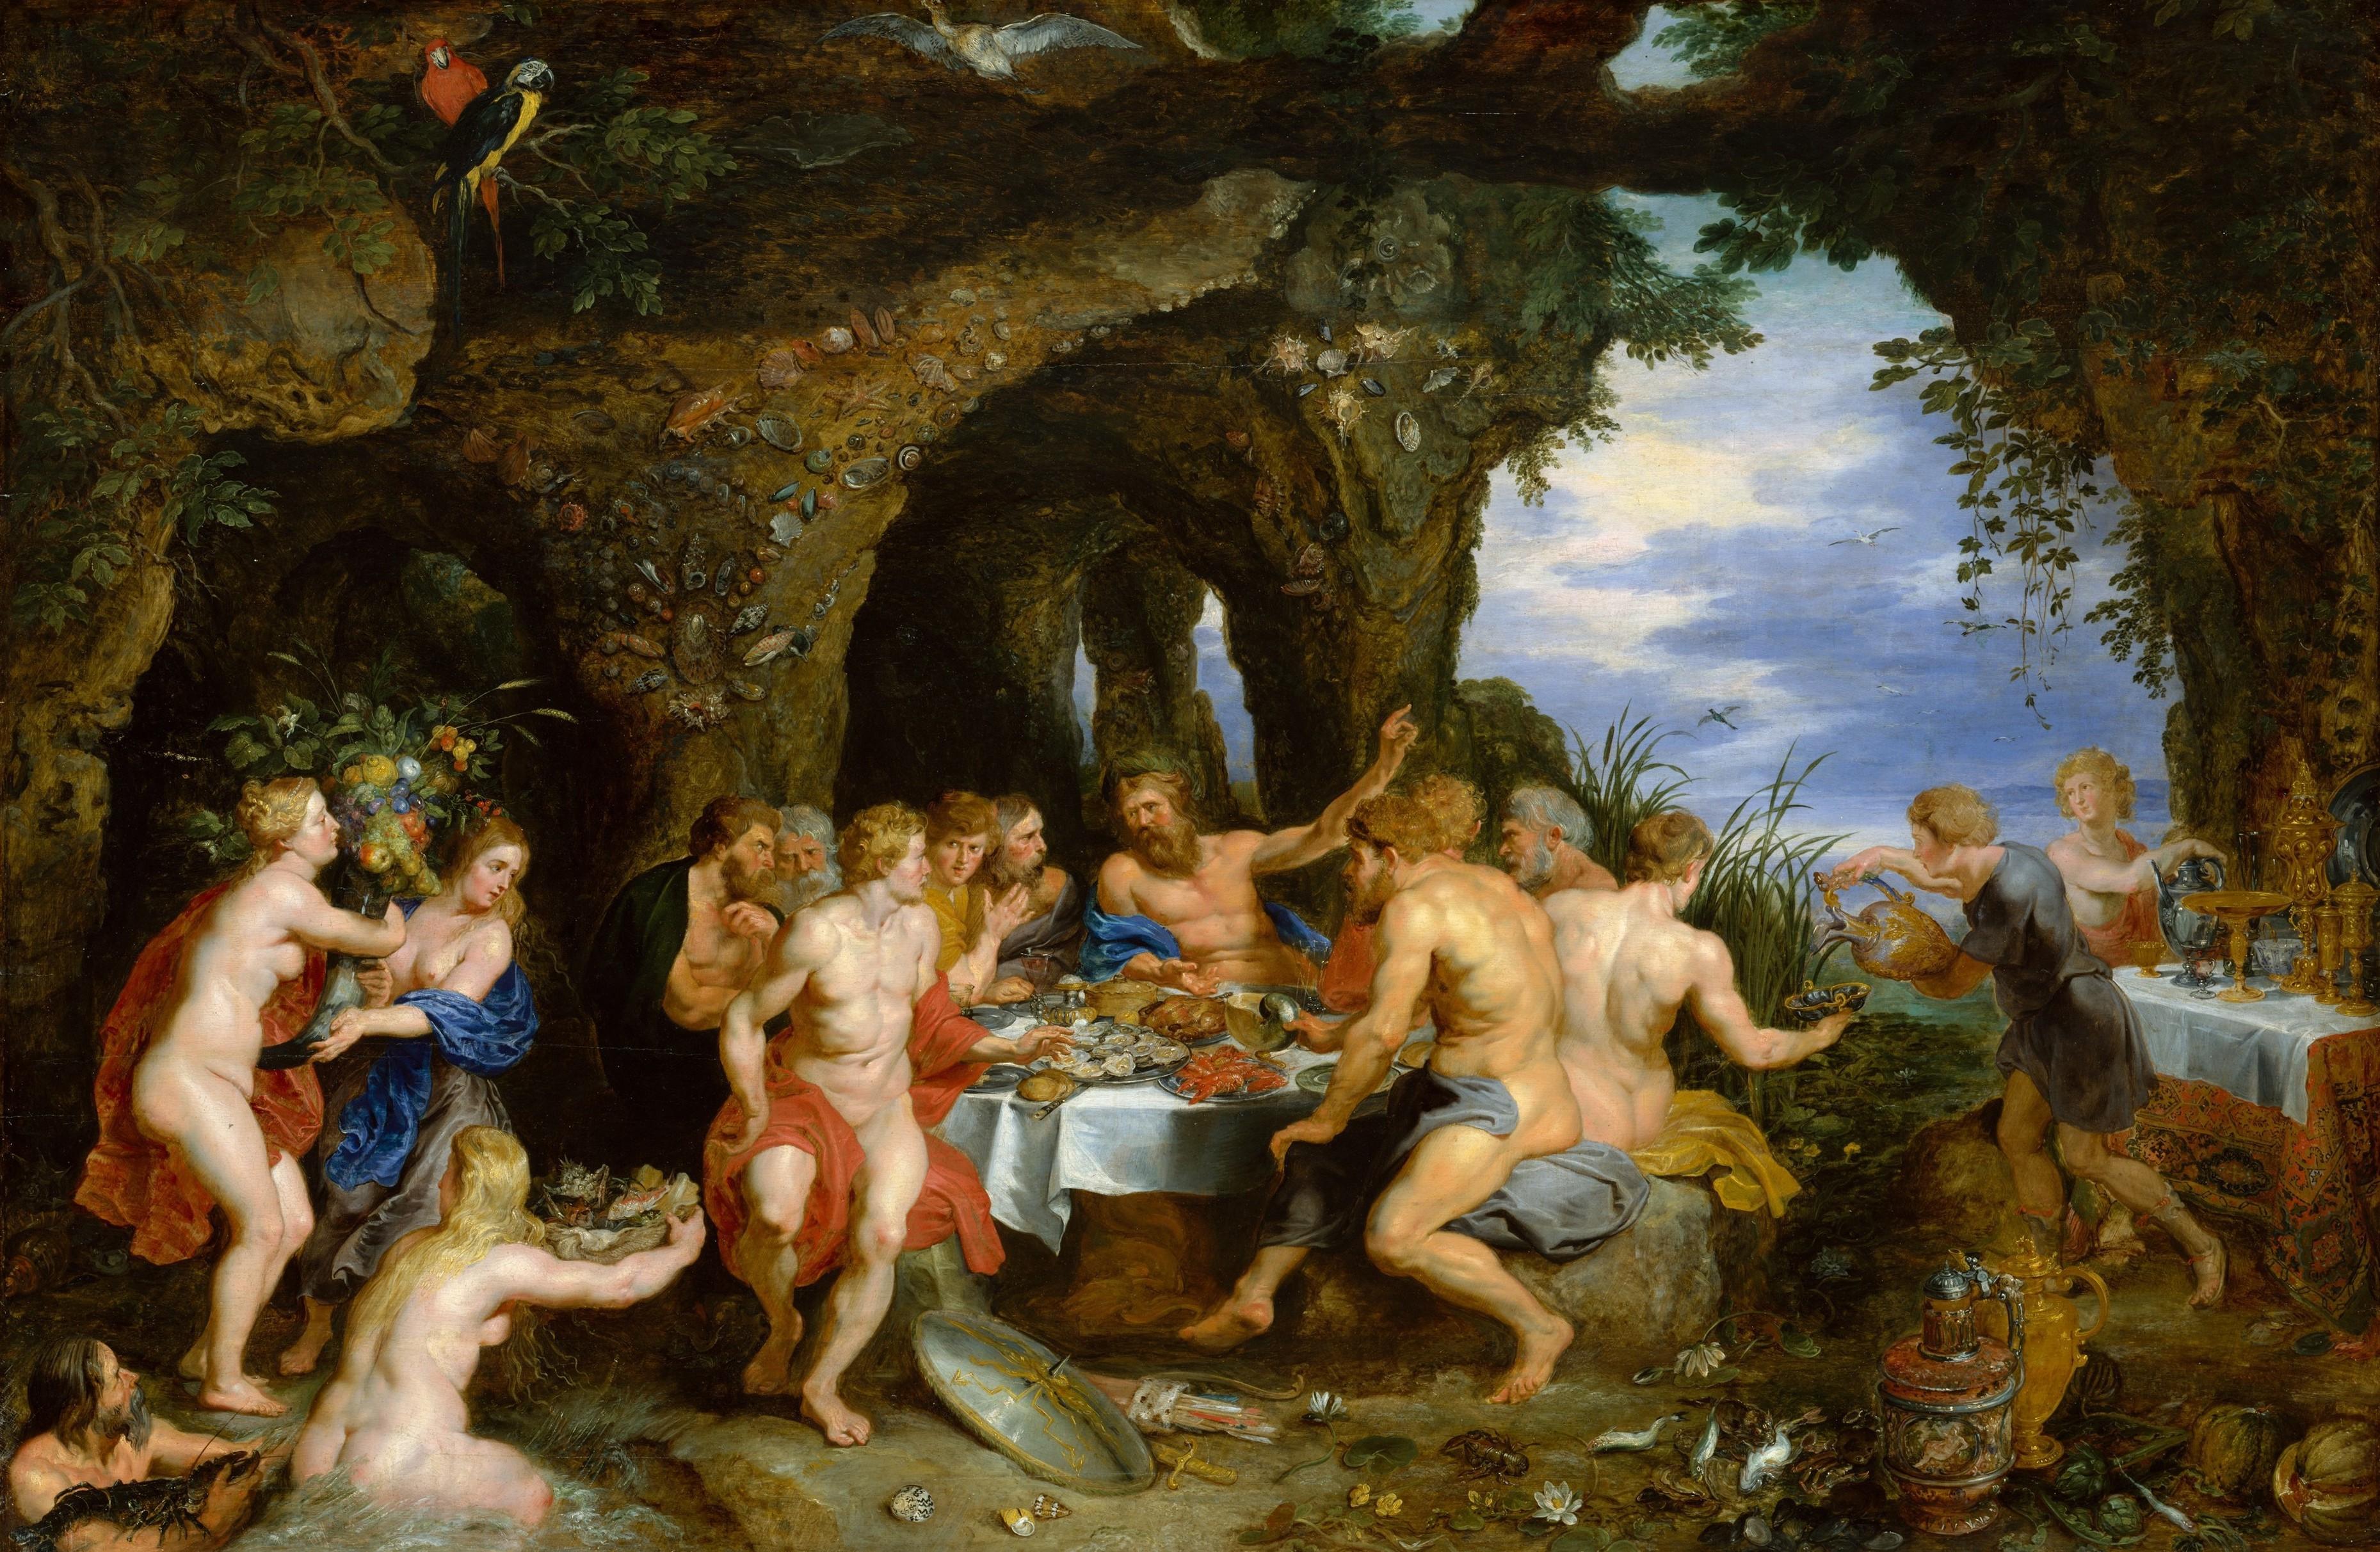 The Feast of Achelous, Rubens